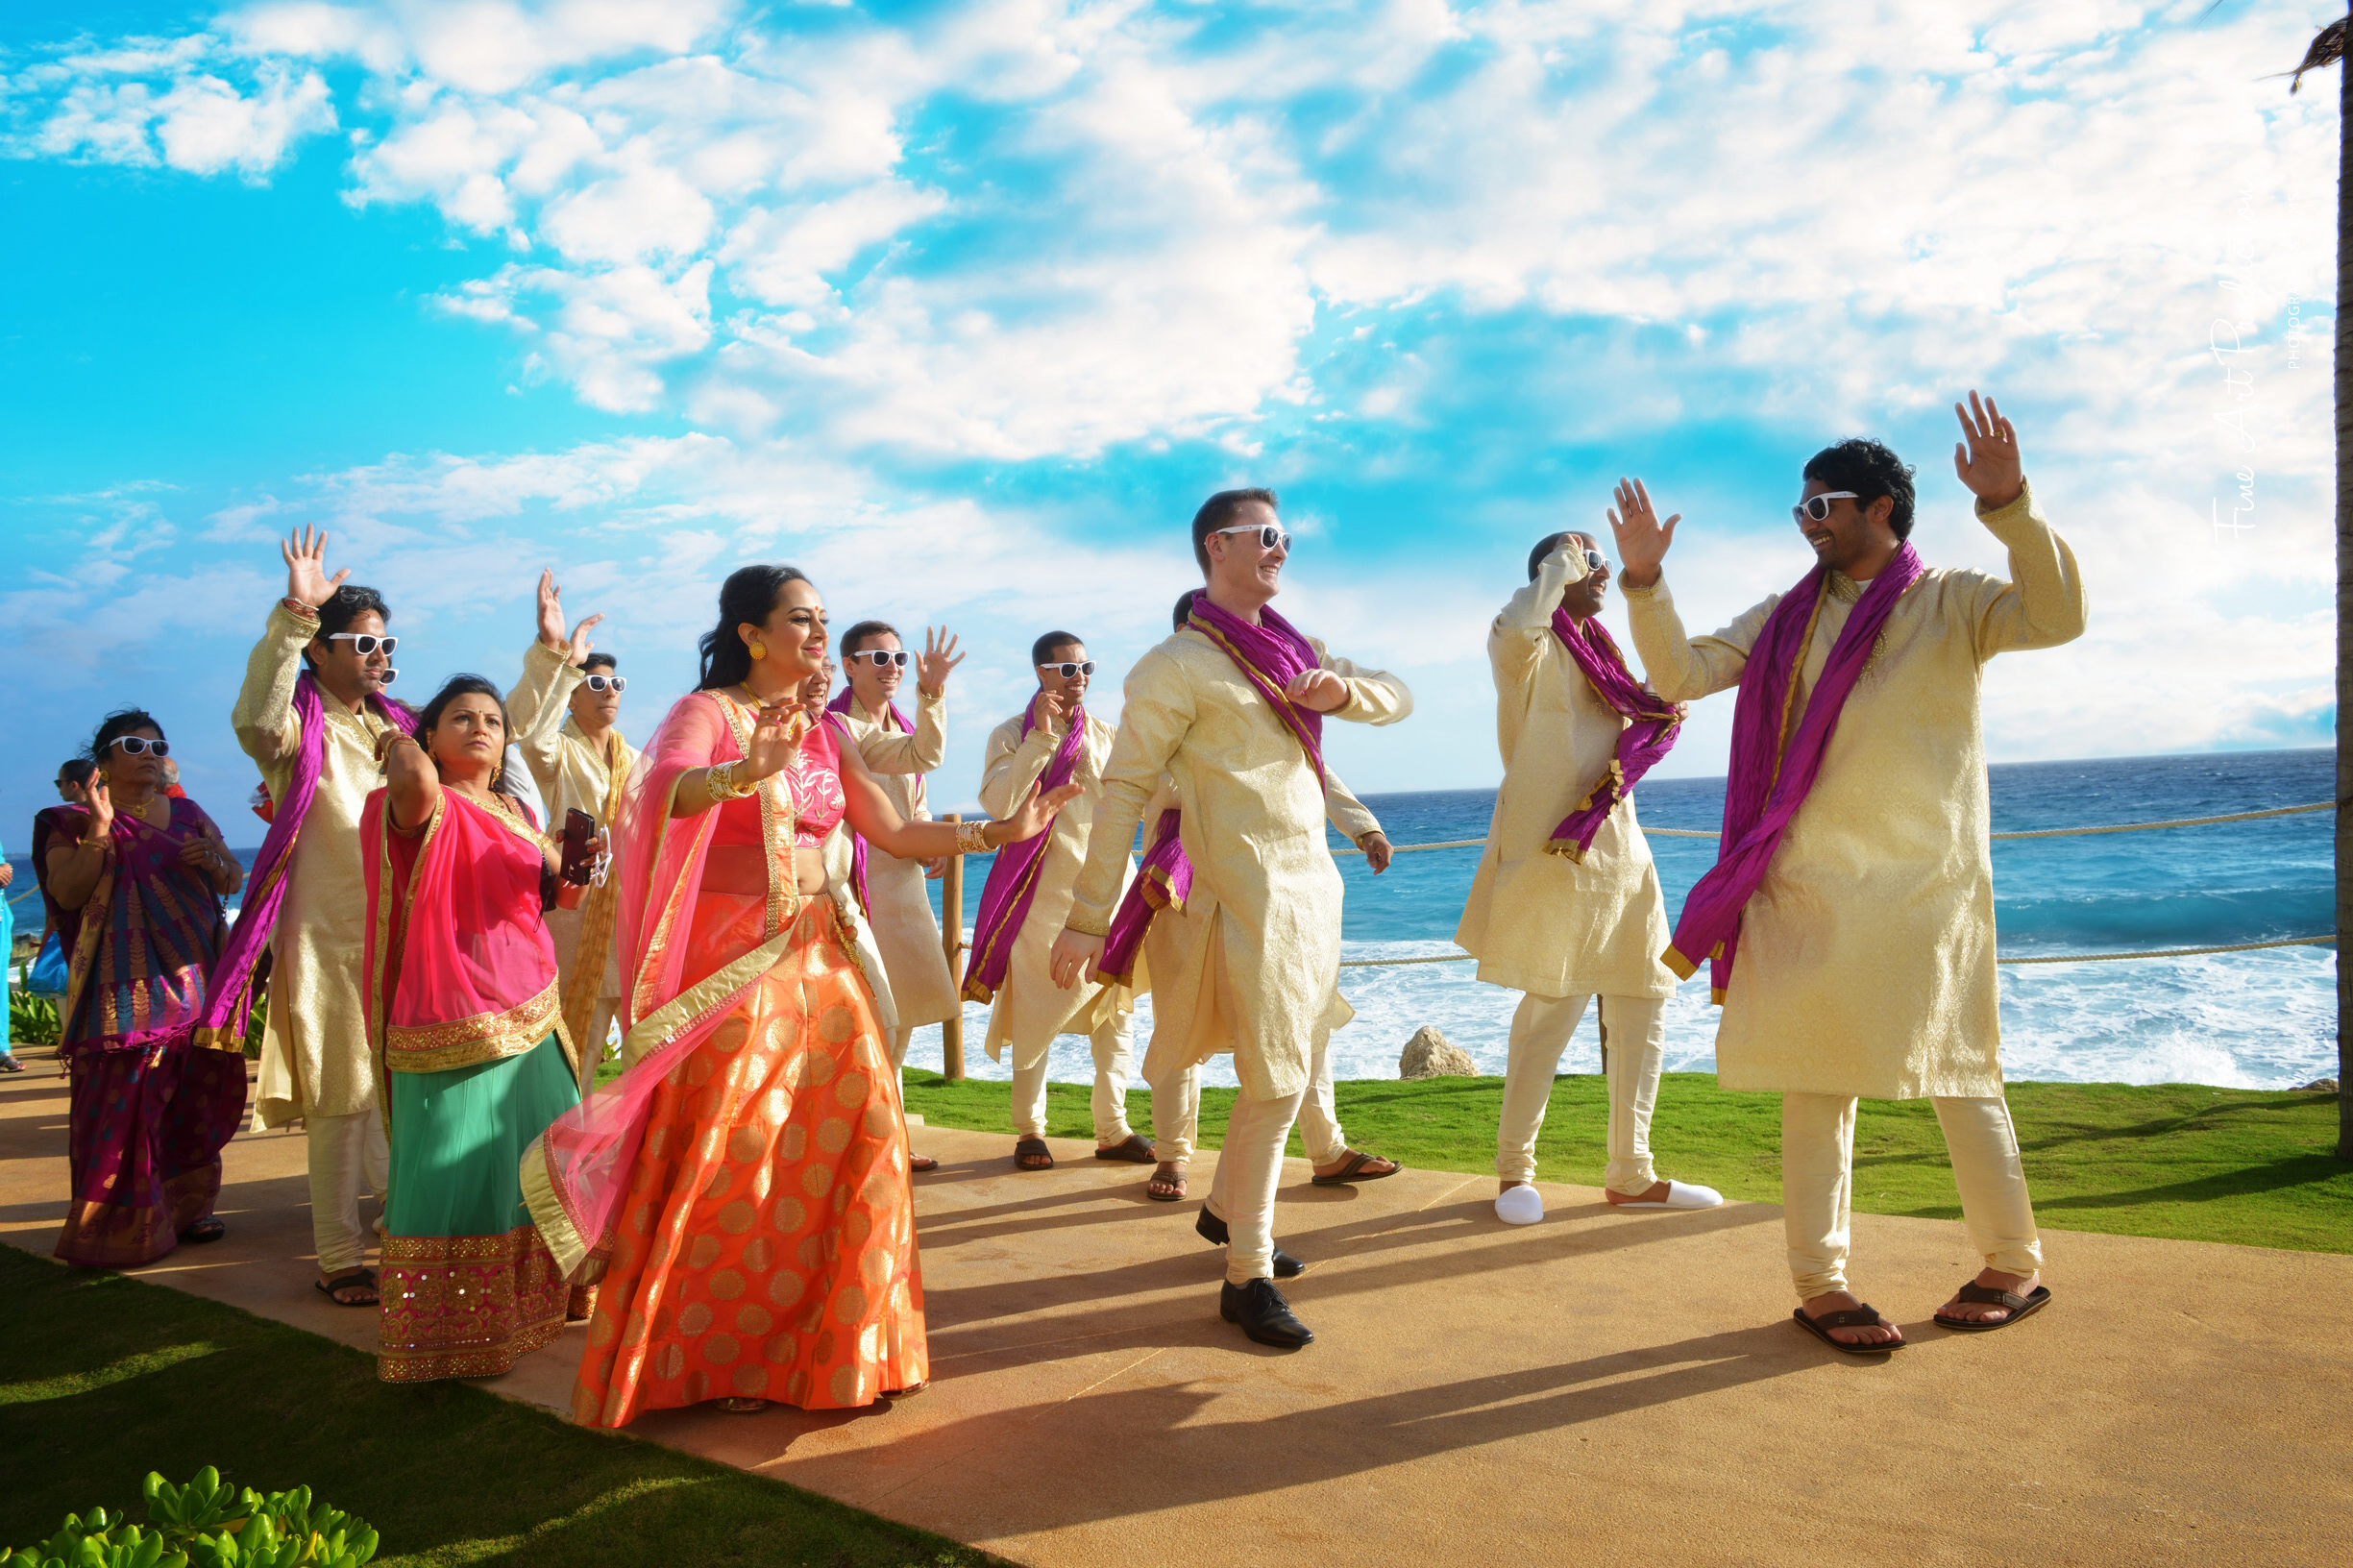 india-wedding-photographer-fine-art-production-chirali-amish-thakkar_0135